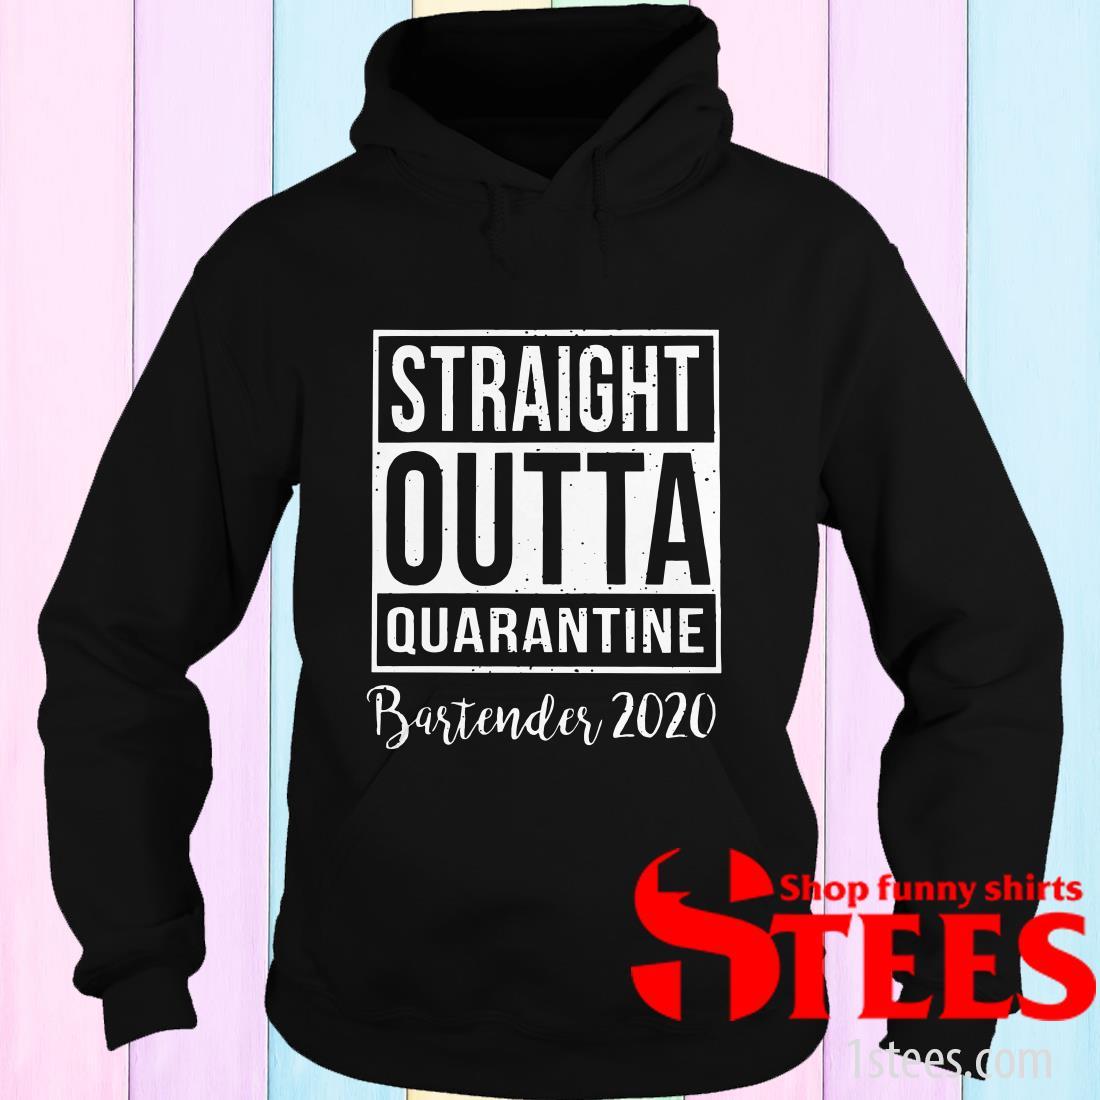 2020 Straight Outta Quarantine Bartender Hoodies